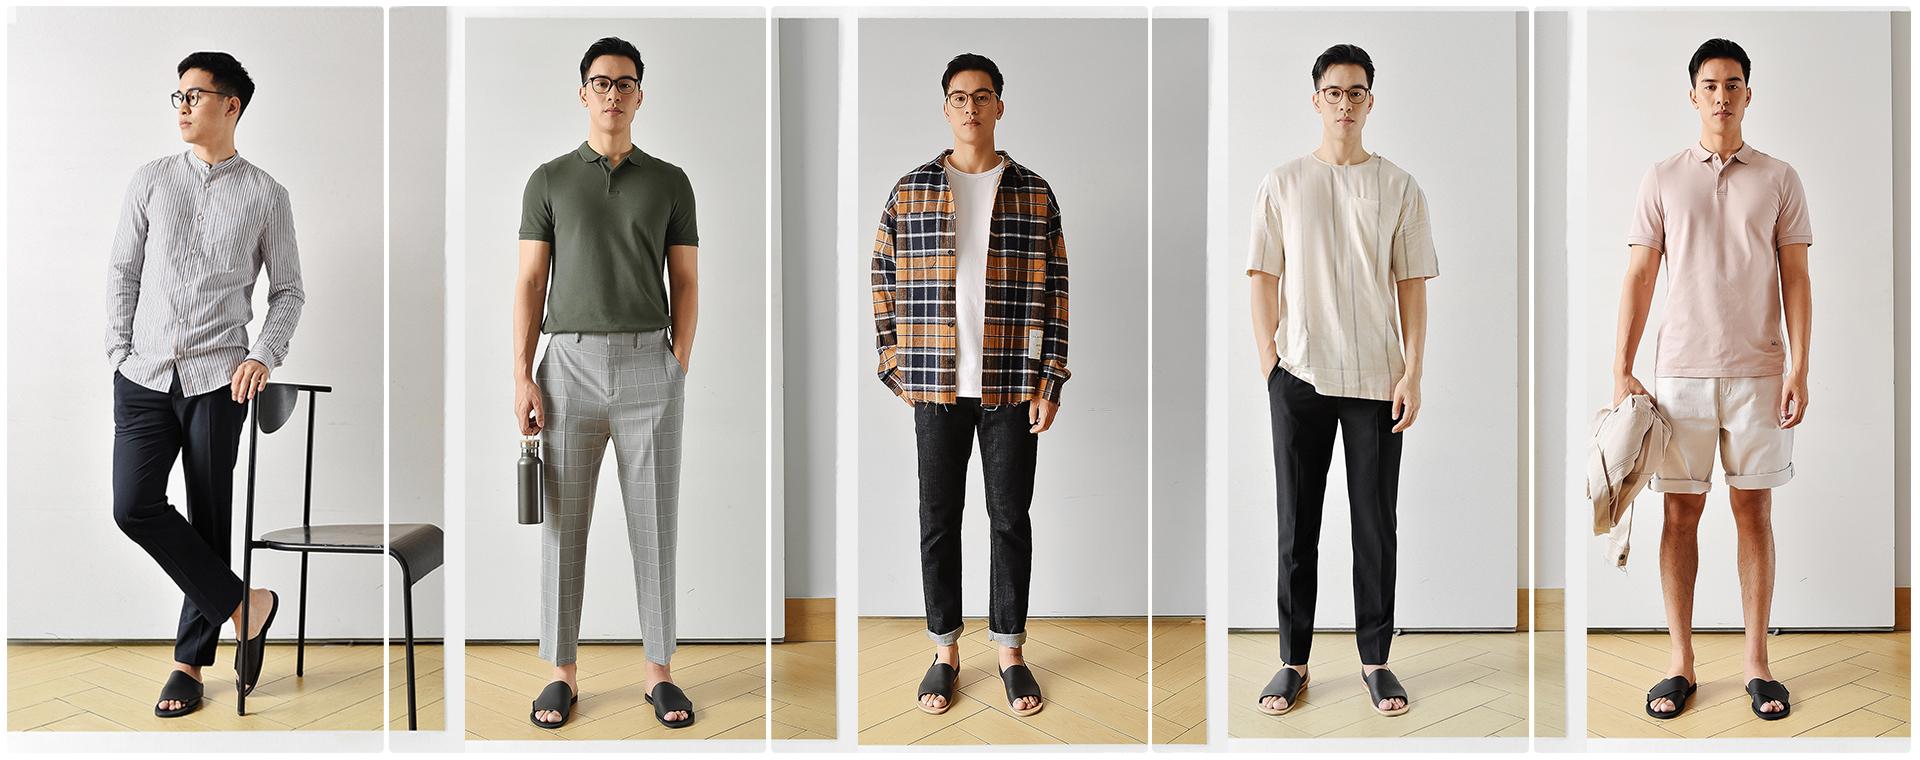 Thời trang nam – Thời Trang Nam Nữ Routine